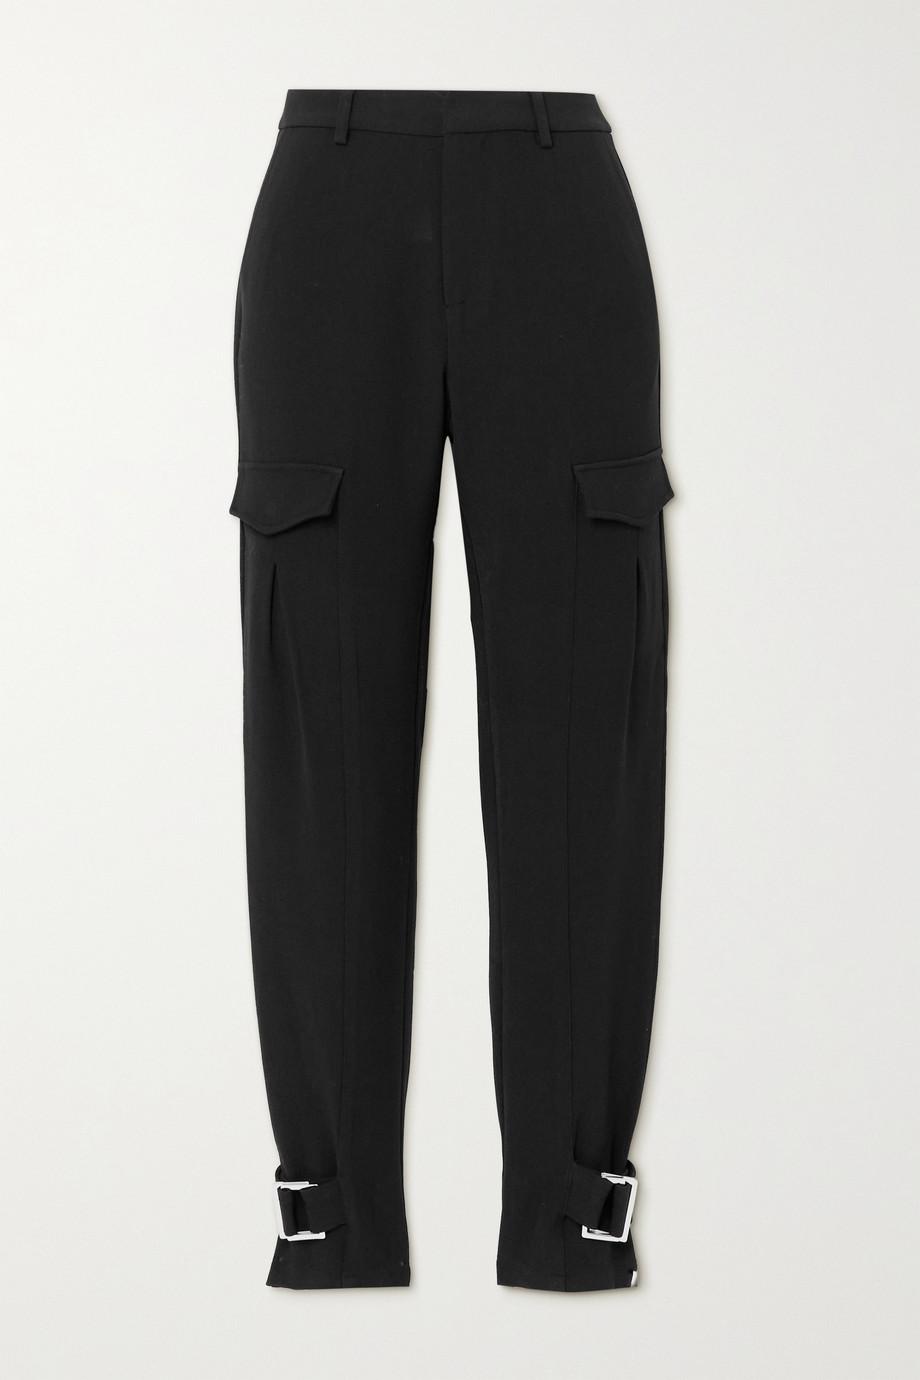 Holzweiler Skunk Suit buckled woven cargo pants